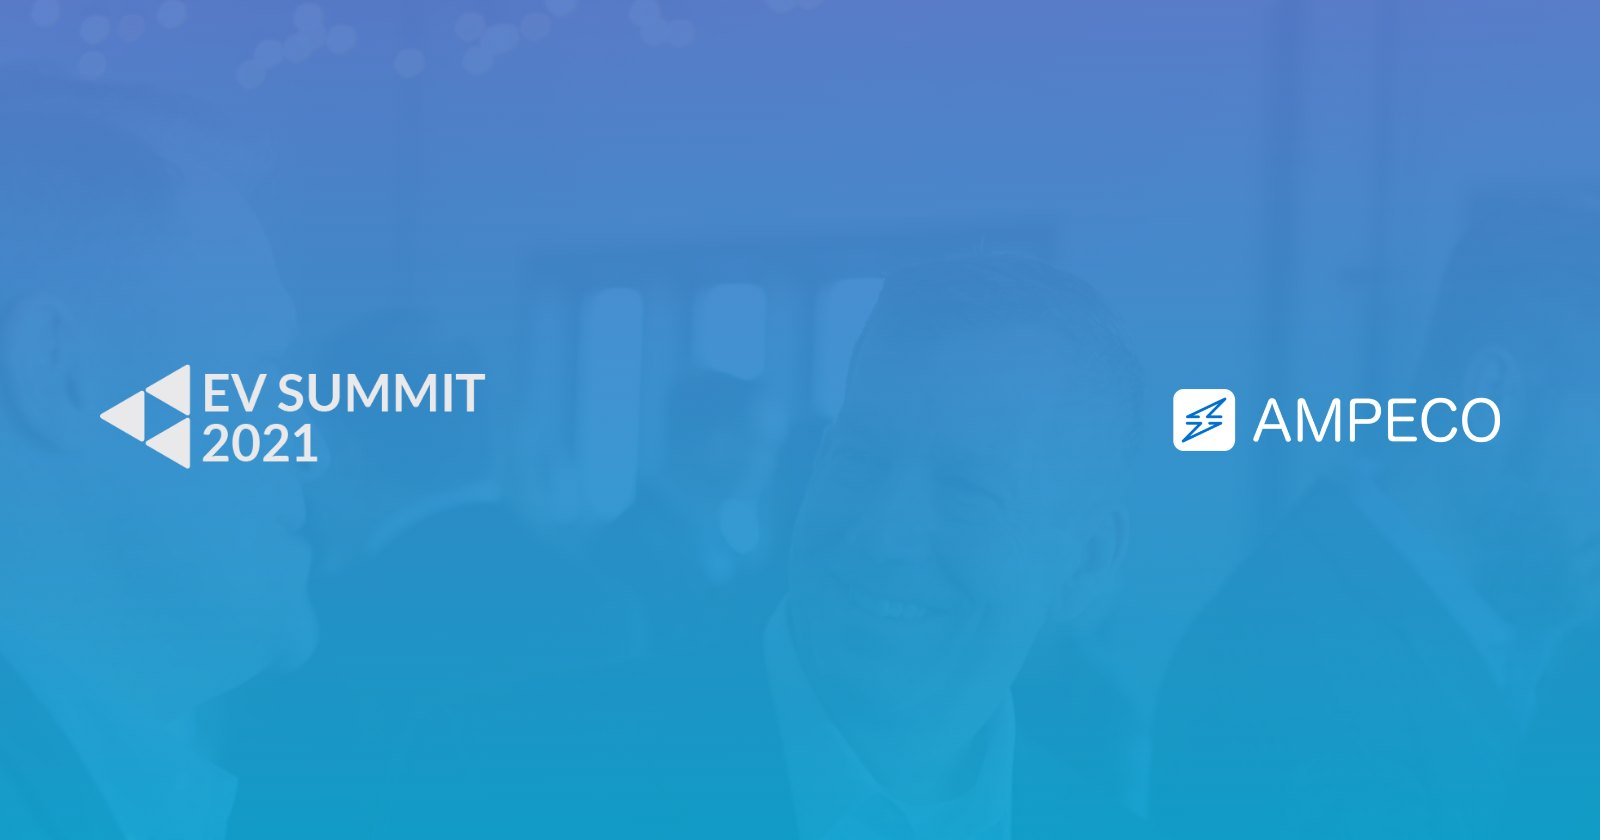 AMPECO at EV Summit 20201